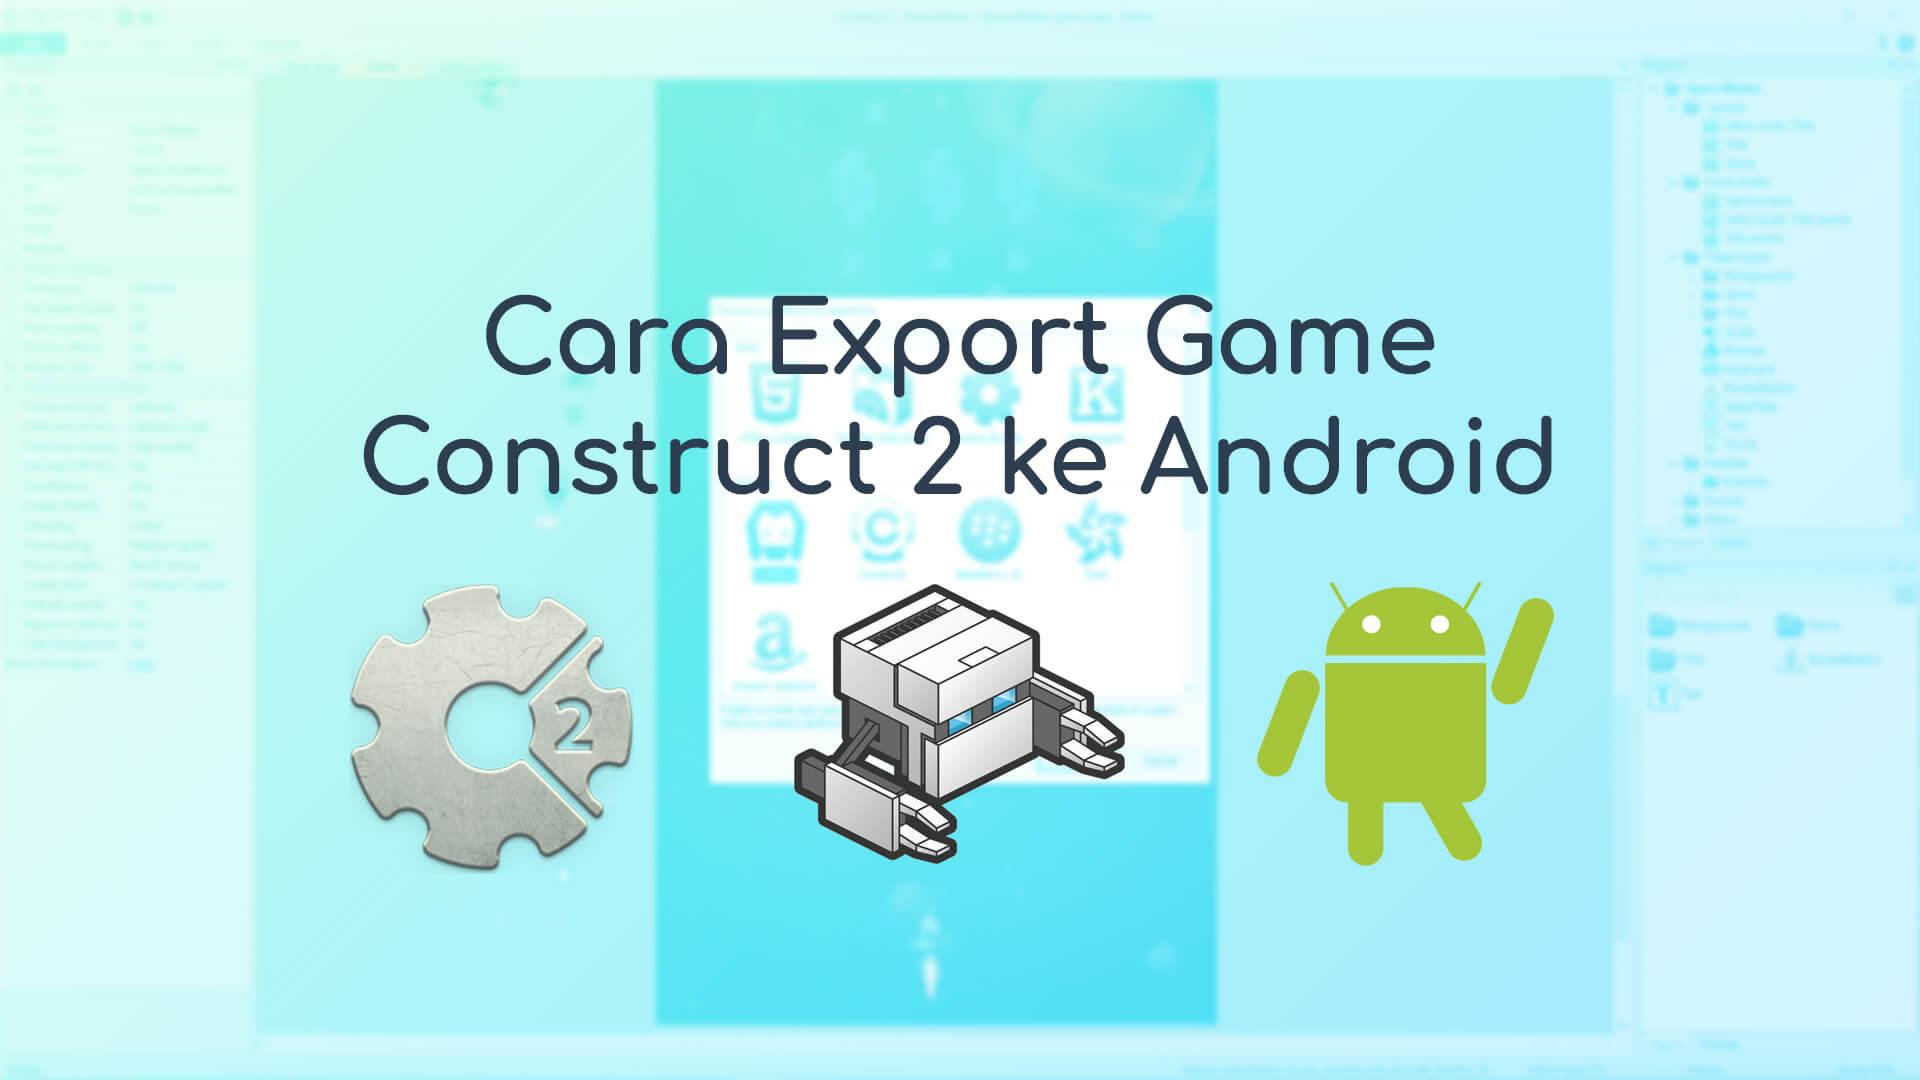 Cara Export Game Construct 2 Ke Android Blog Dicoding Indonesia Blog Dicoding Indonesia